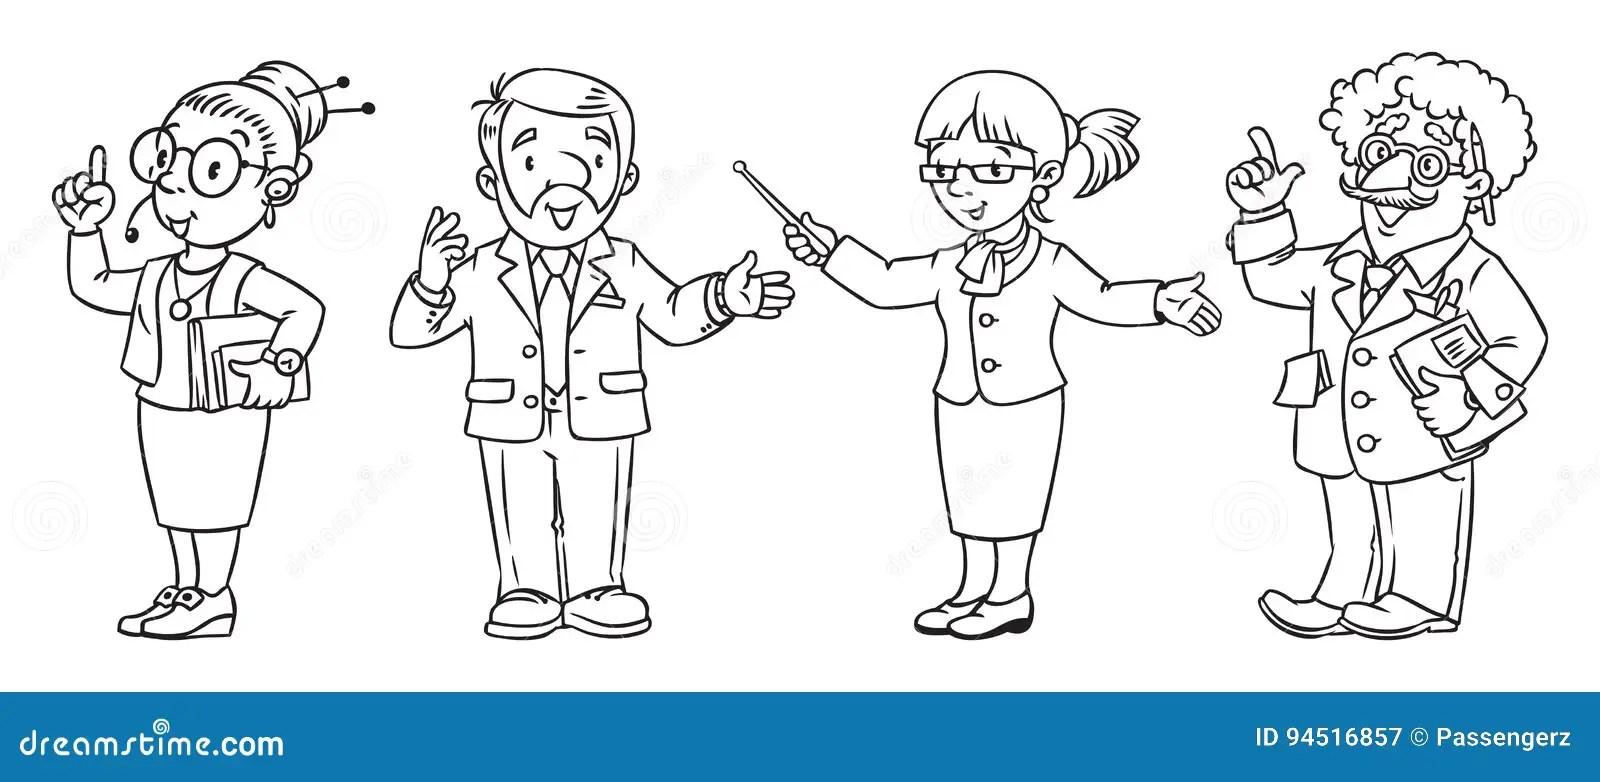 Education Professions Coloring Book. Cartoon Vector